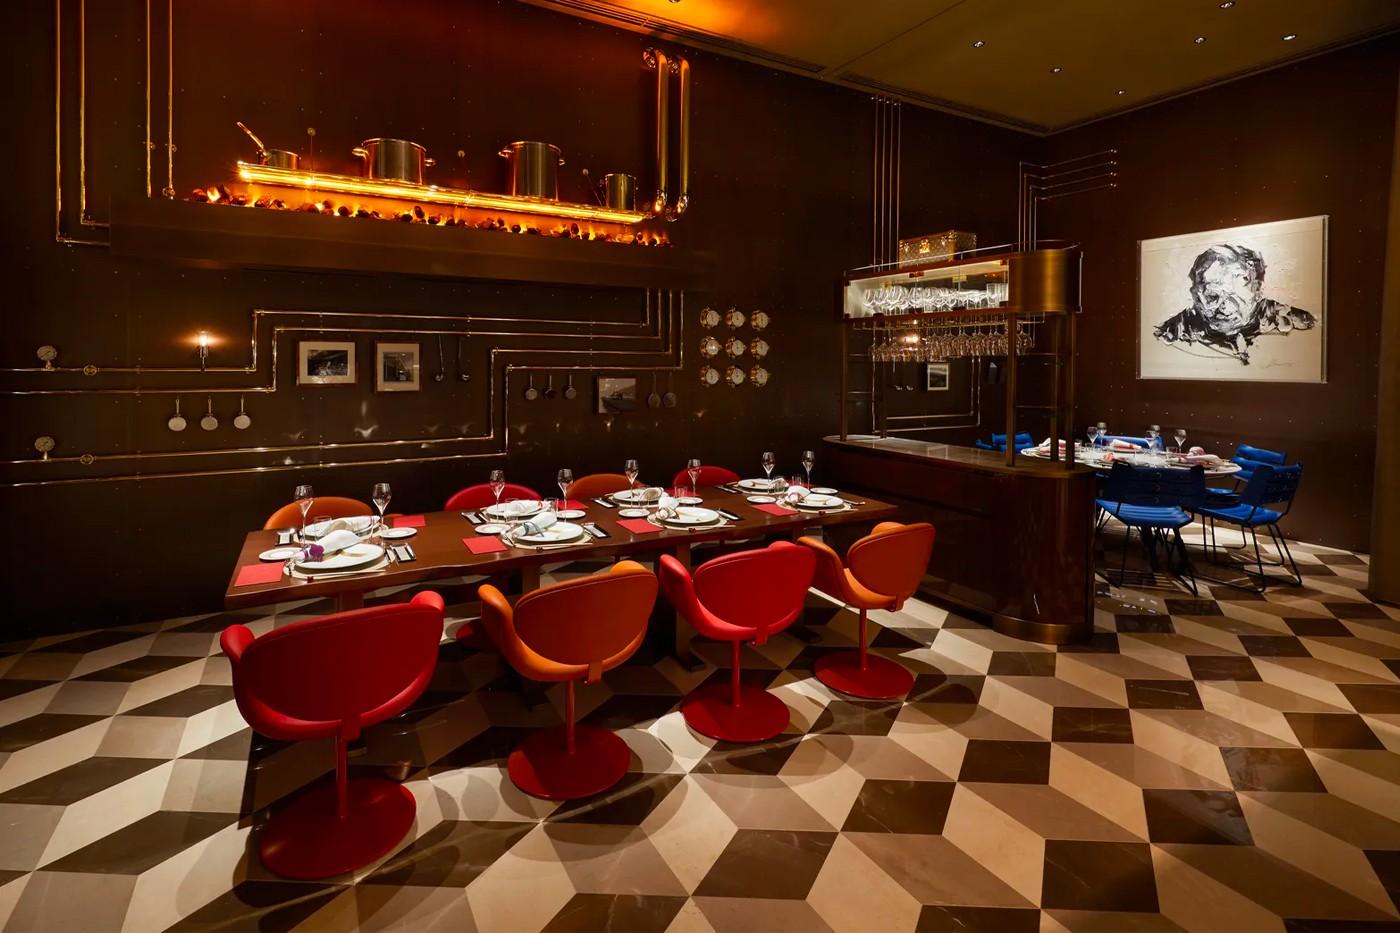 Louis Vuitton restaurant 7